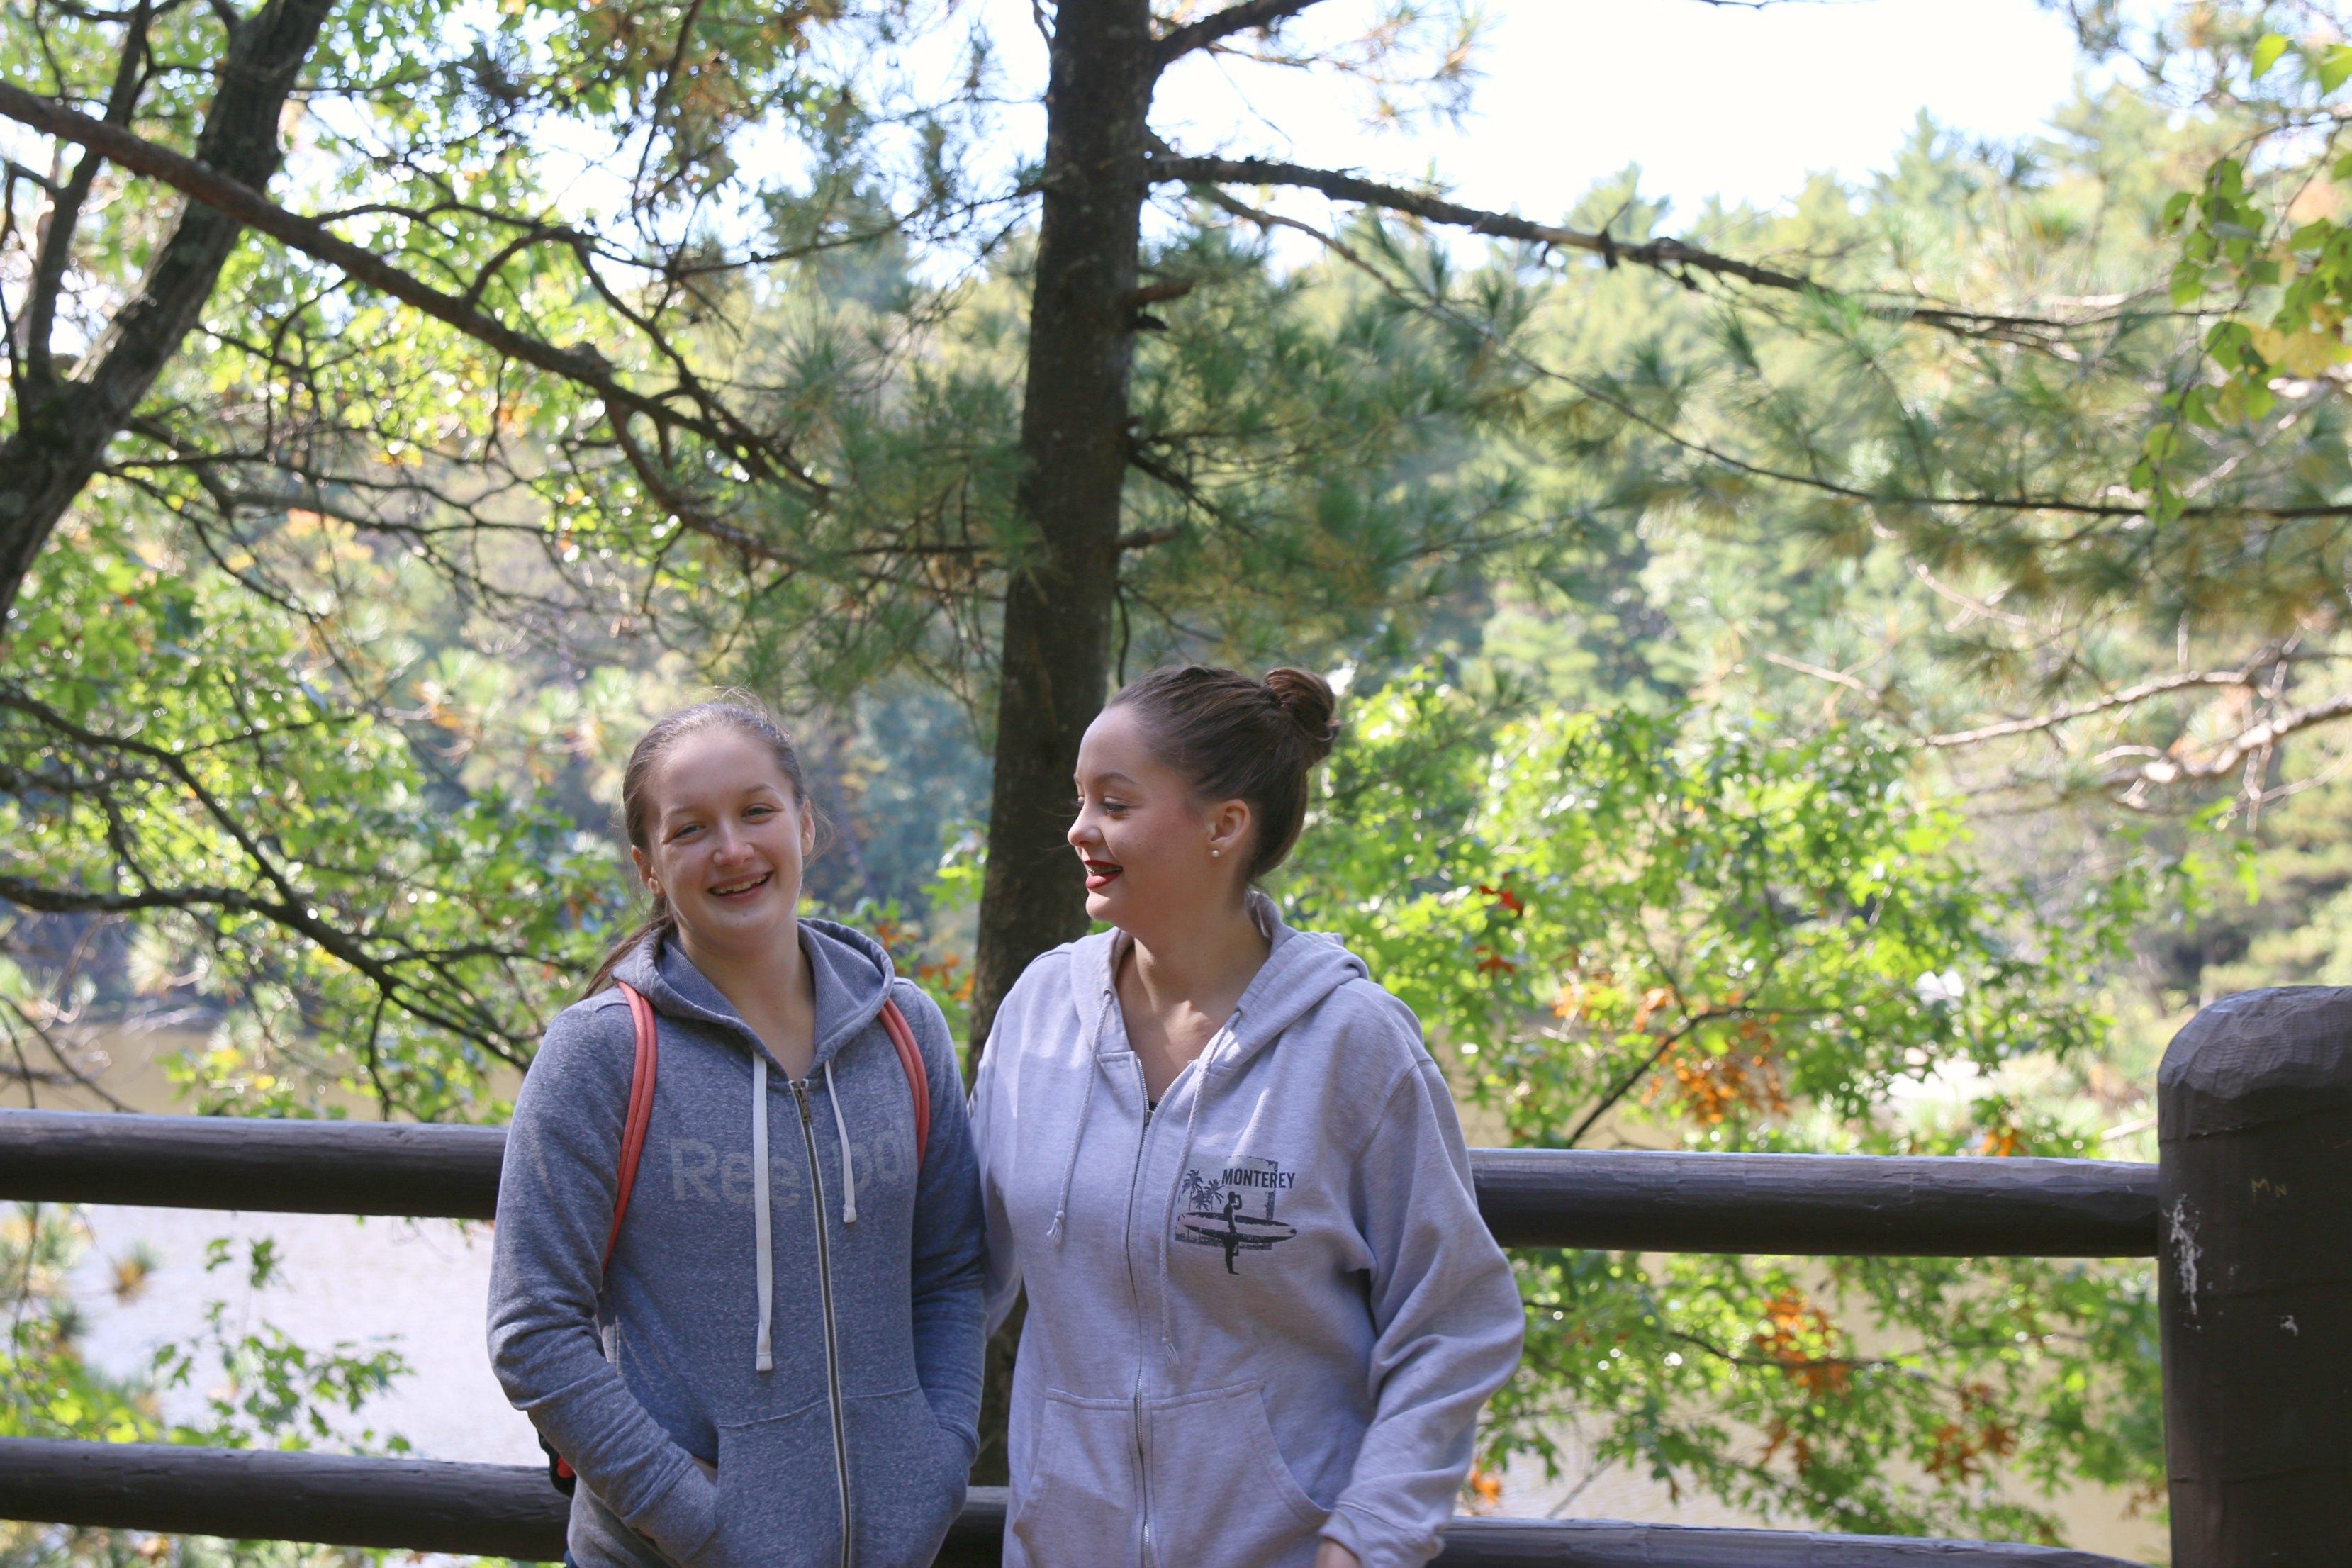 mirror-lake-hiking-trails